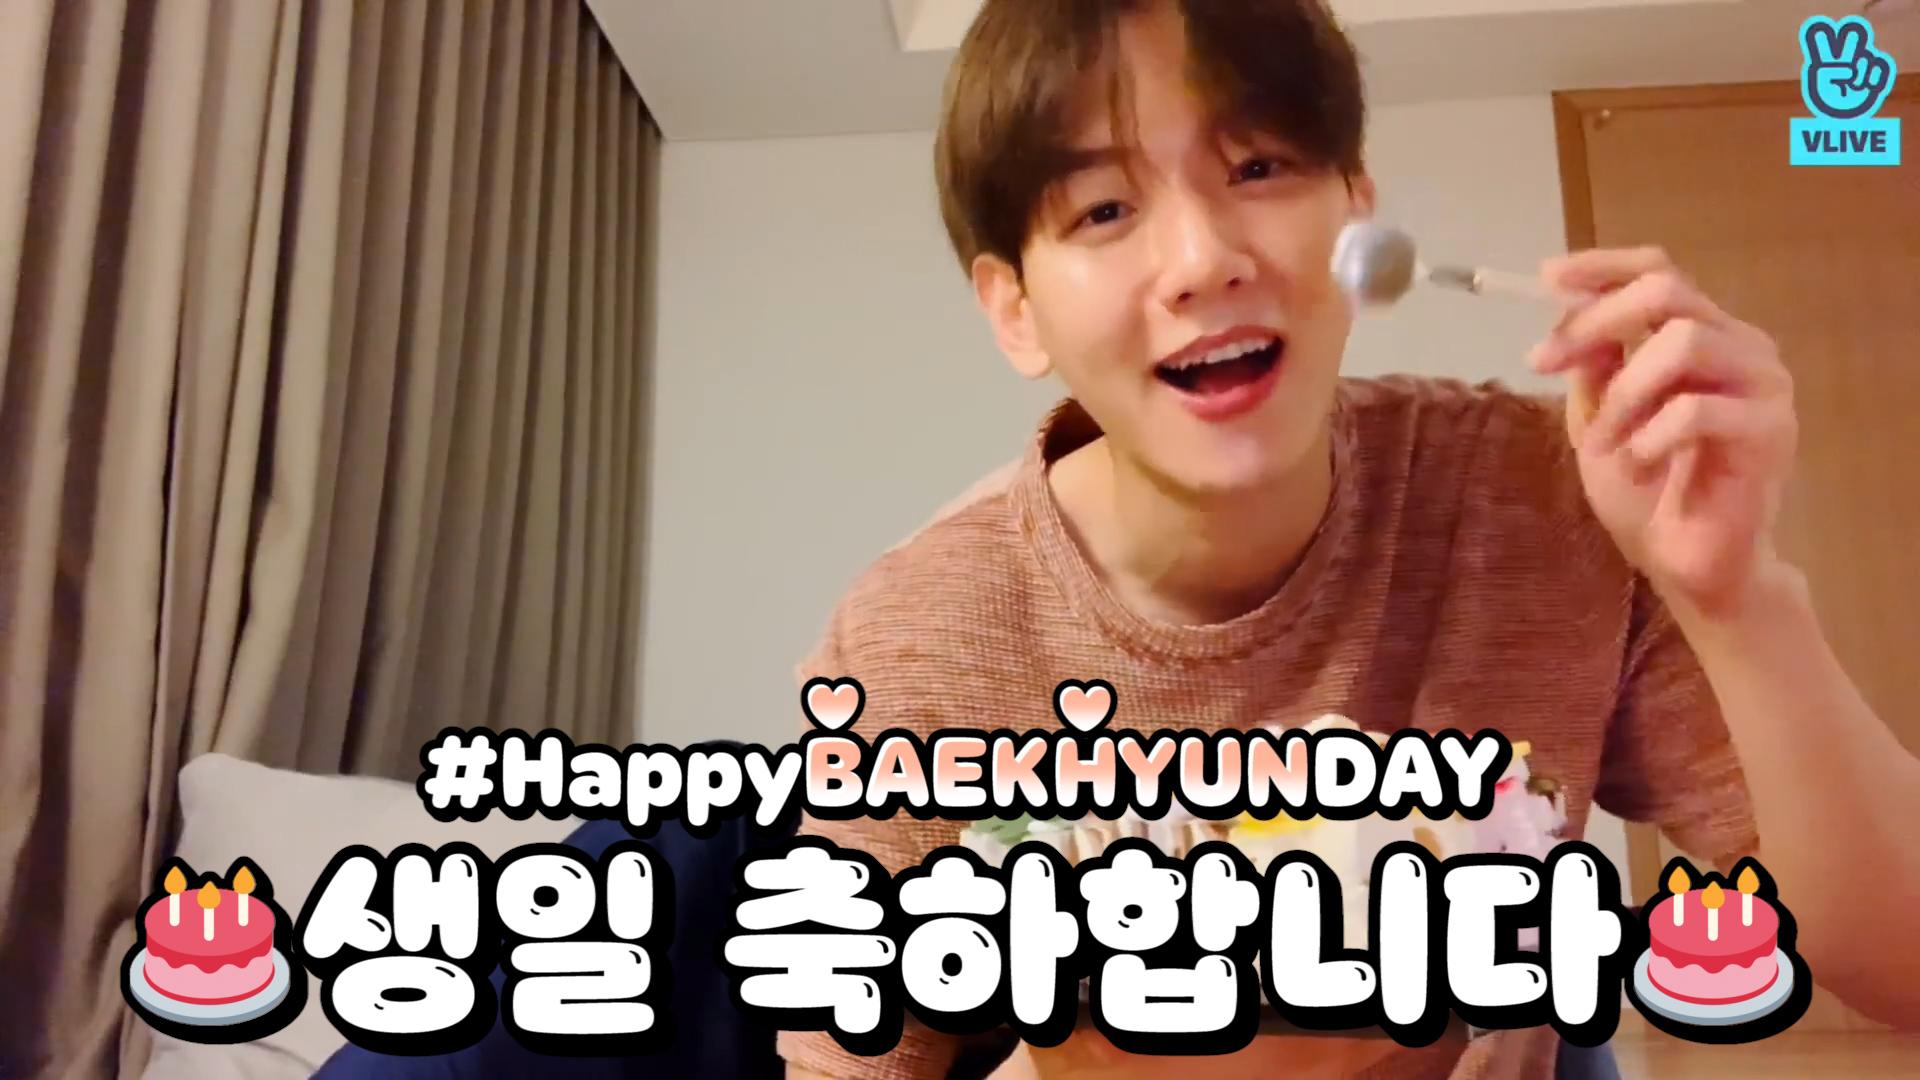 [EXO] 연금복권이 왜 필요해 100세 인생 내내 자랑스런 큥이 있는데❤️ (HAPPY BAEKHYUN DAY!)